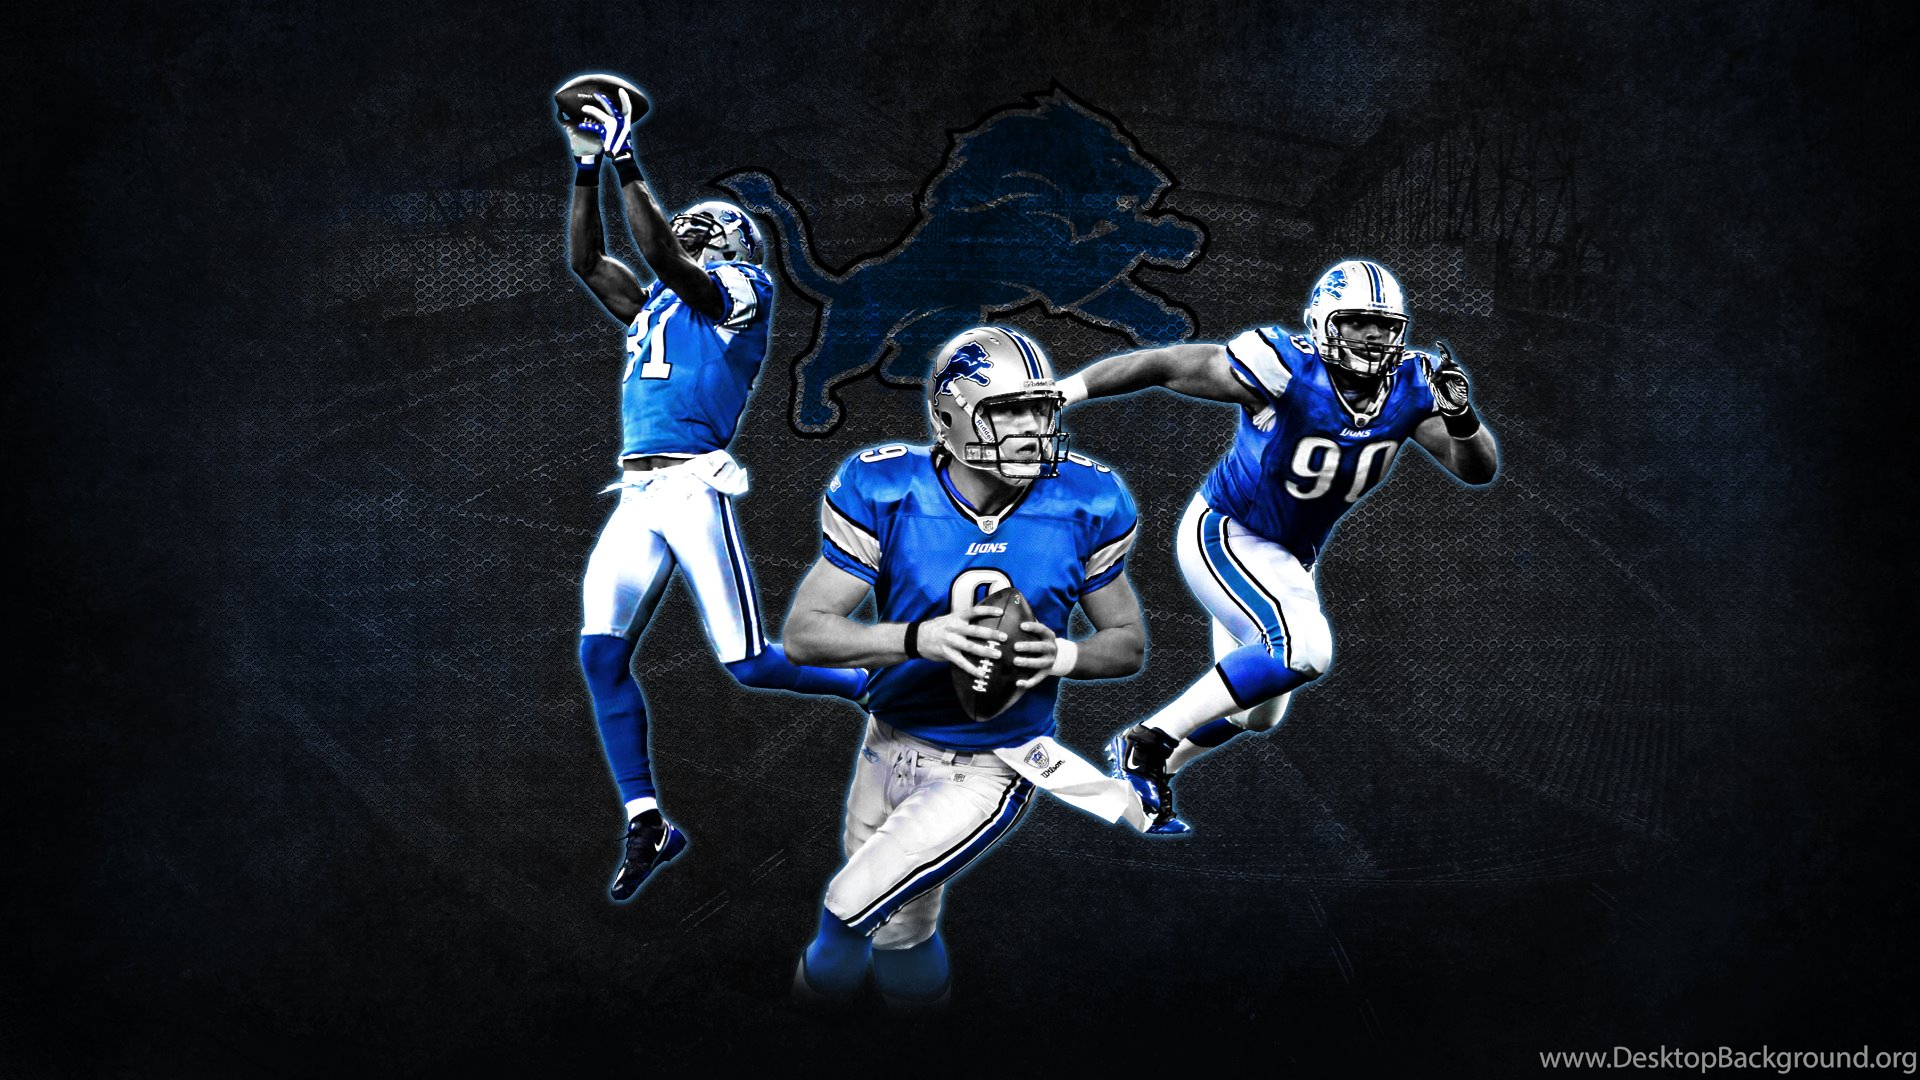 nfl football player detroit lions wallpapers hd. free desktop